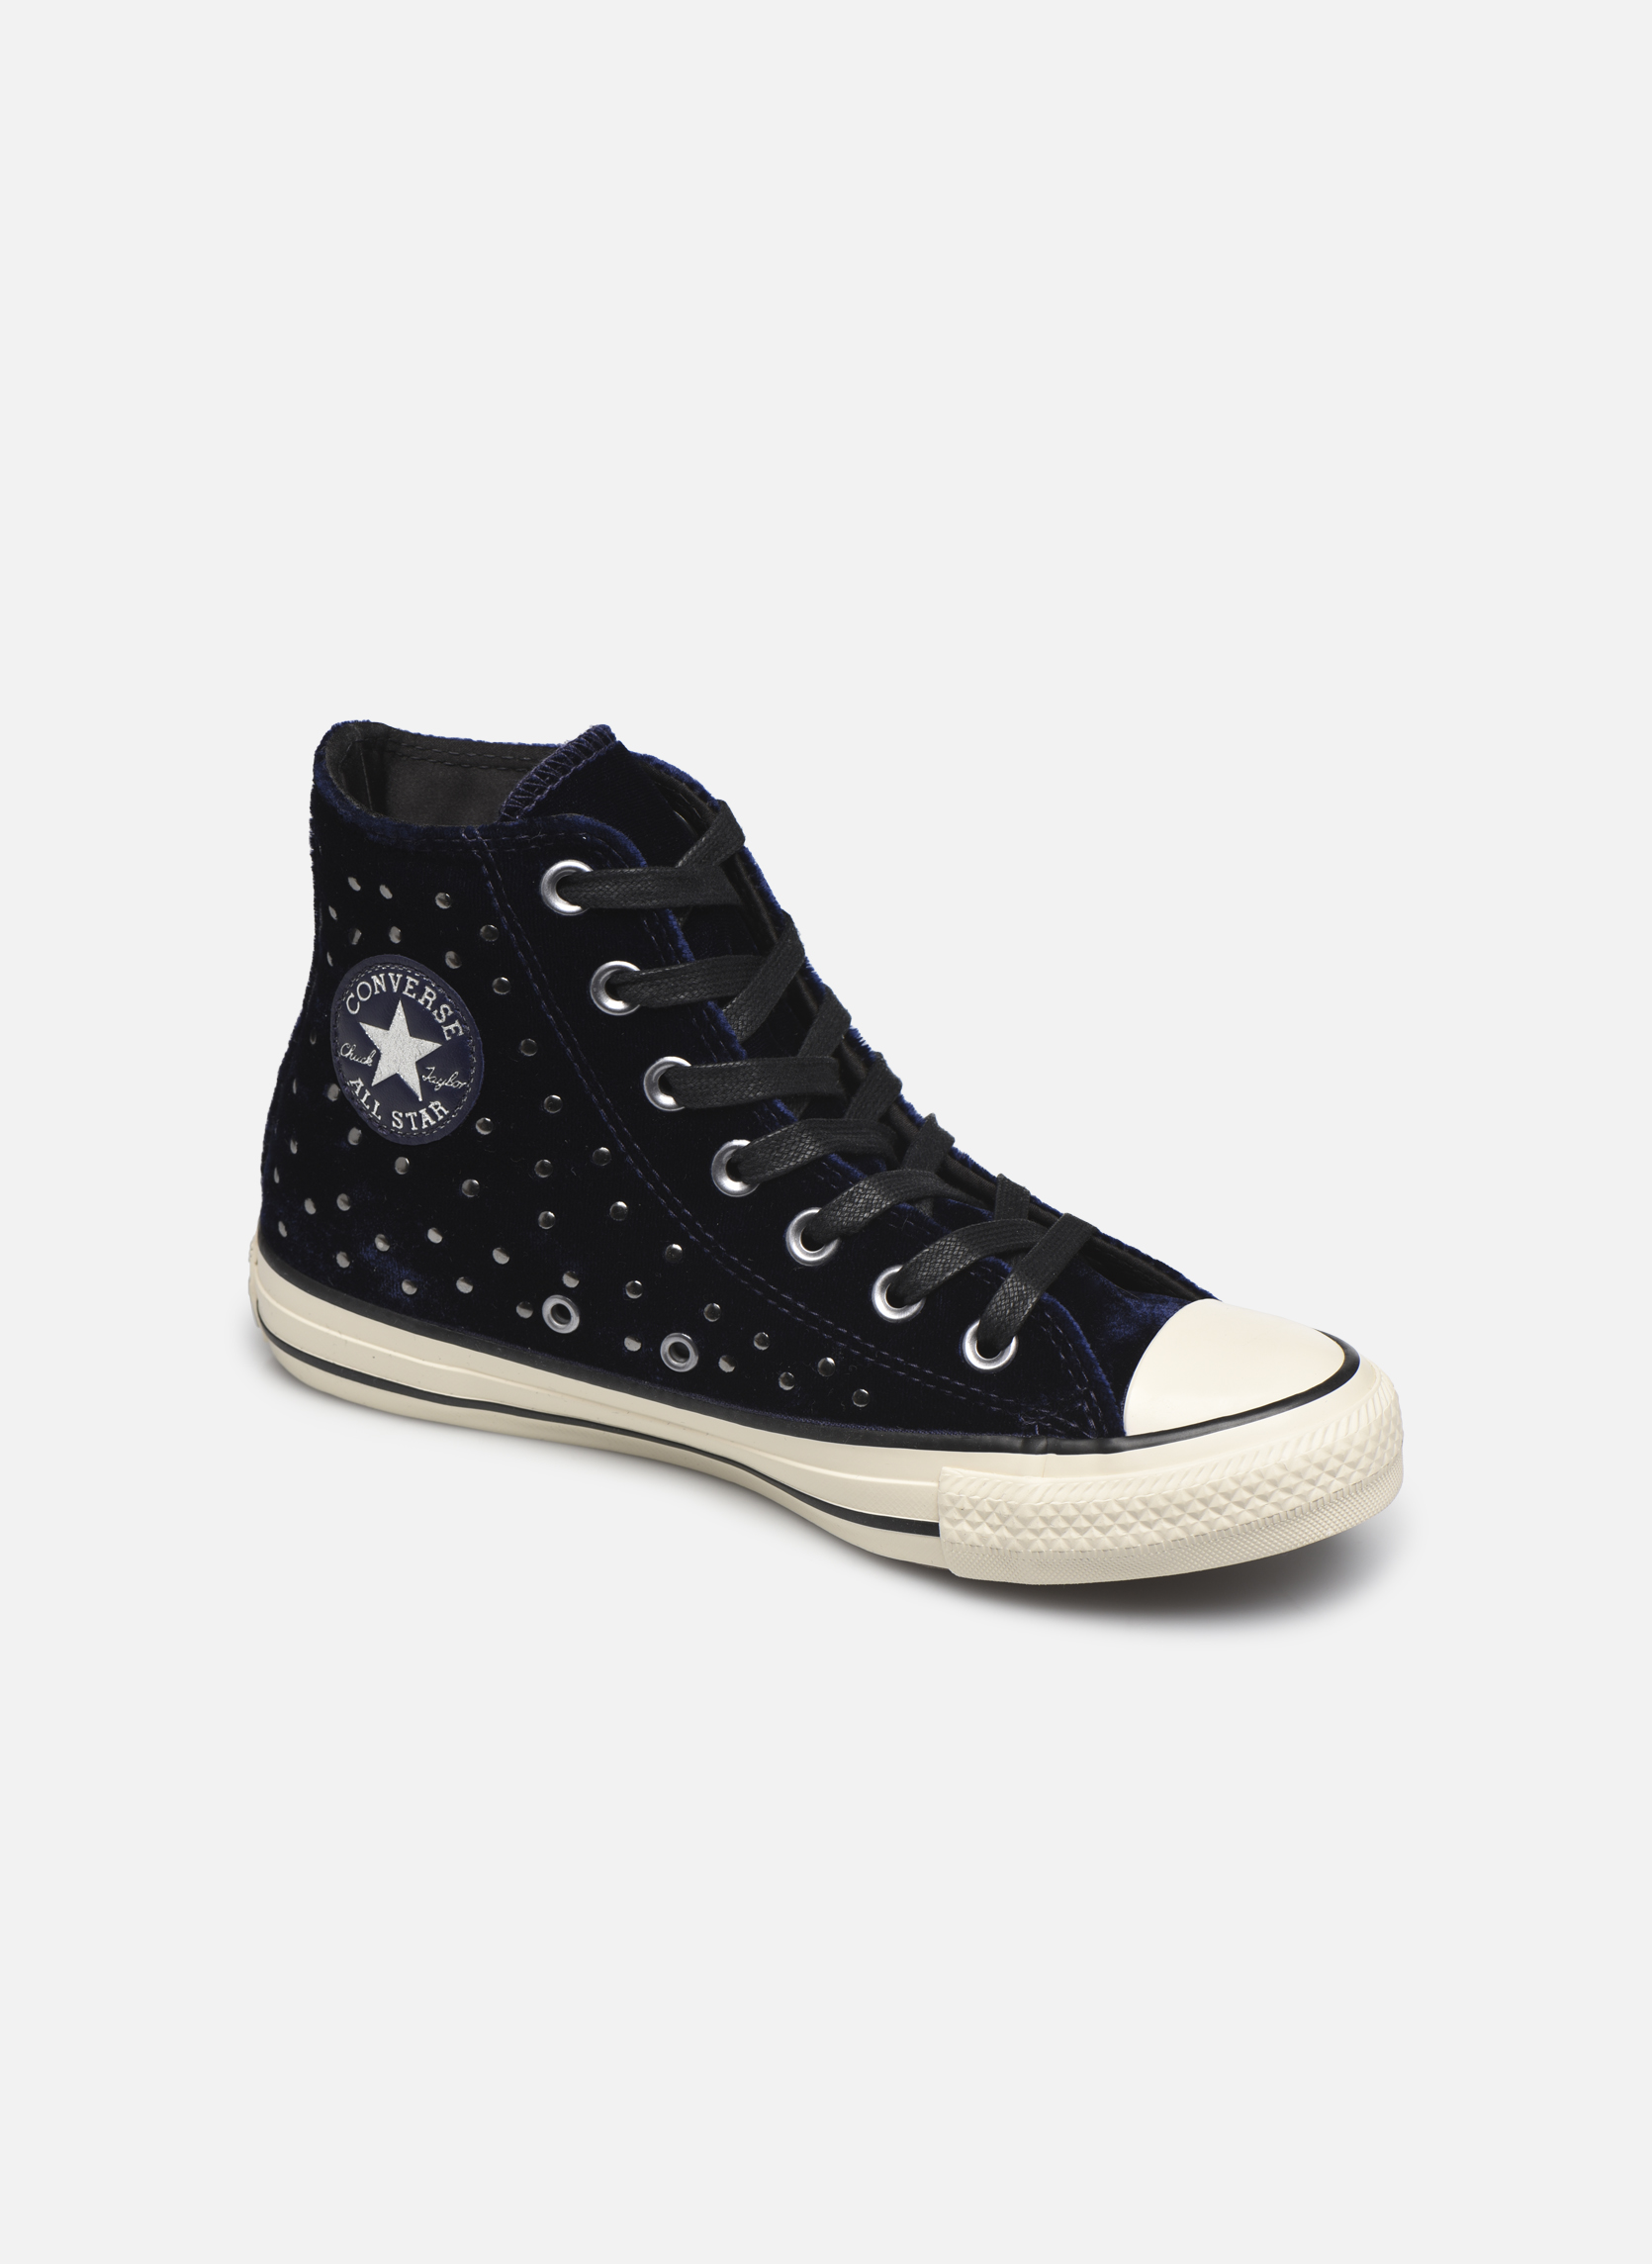 Converse Star Studs Black Turtledove Velvet Taylor All Eclipse Chuck Hi SrSqH